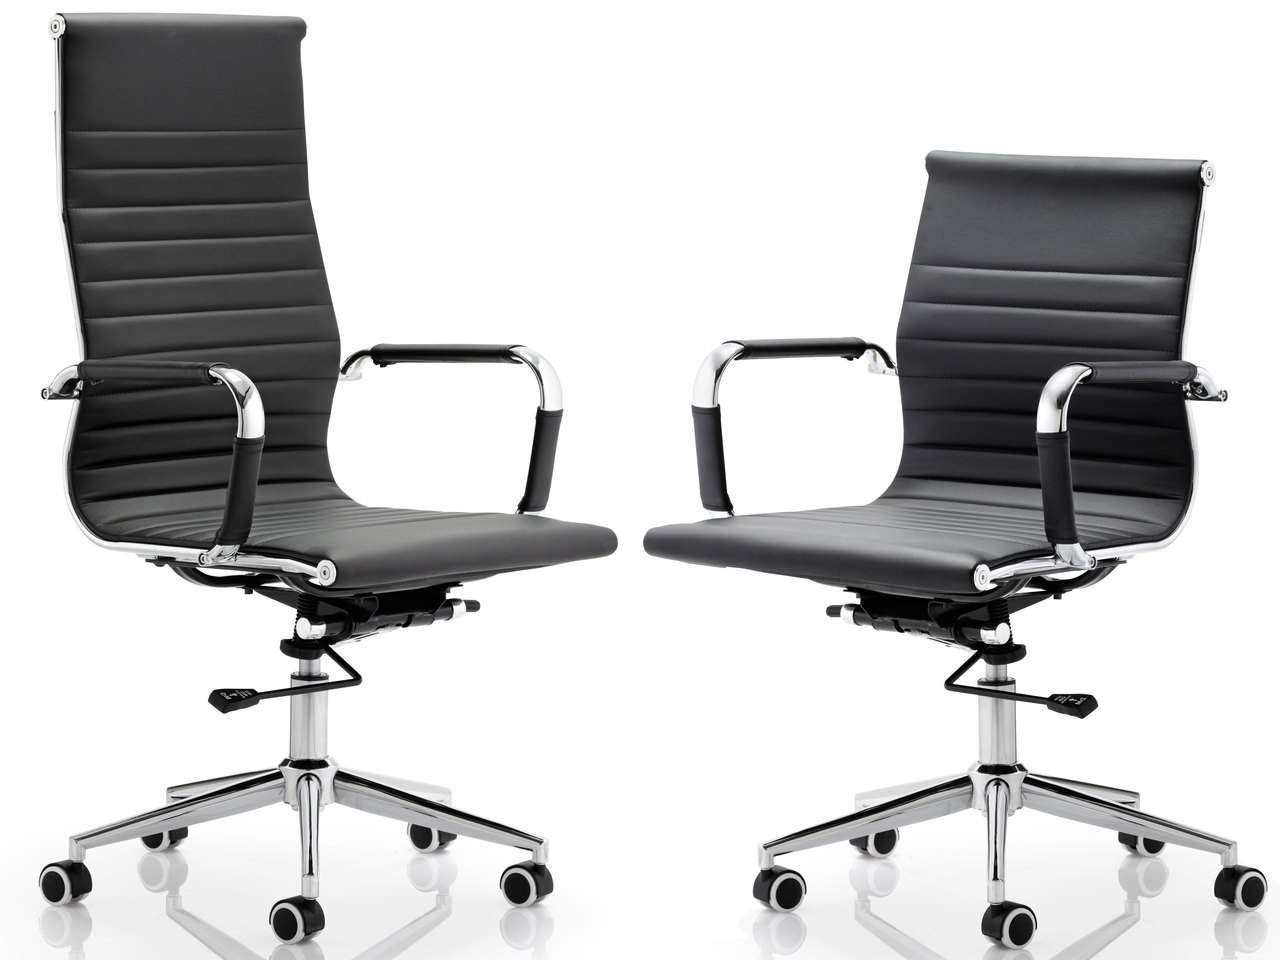 Cross Medium and High Back Executive Office Chair